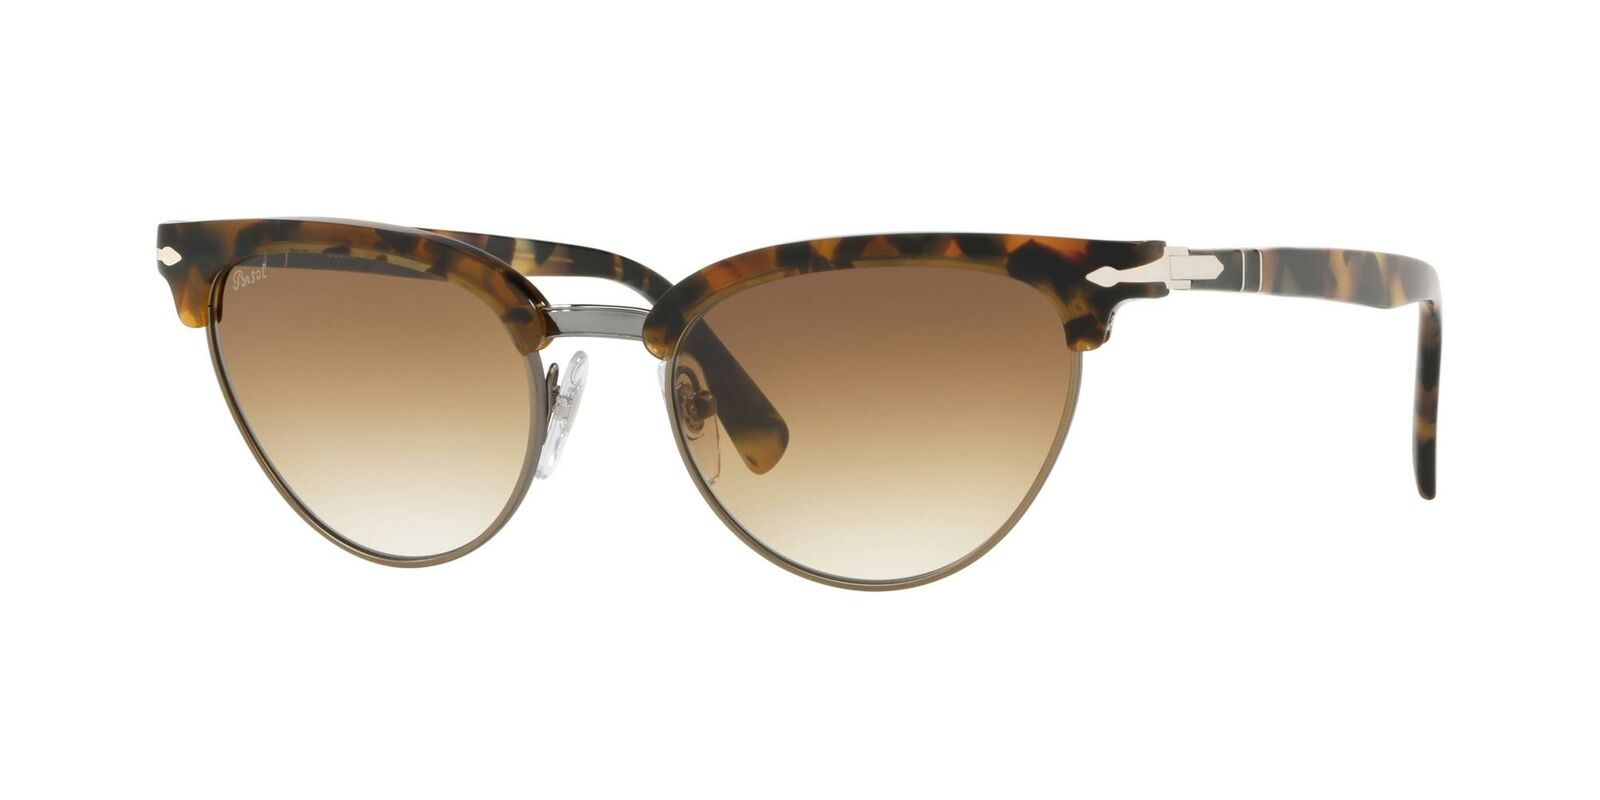 Persol SARTORIA PO 3198S Dark Tortoise/Brown Shaded 51/19/145 women Sunglasses